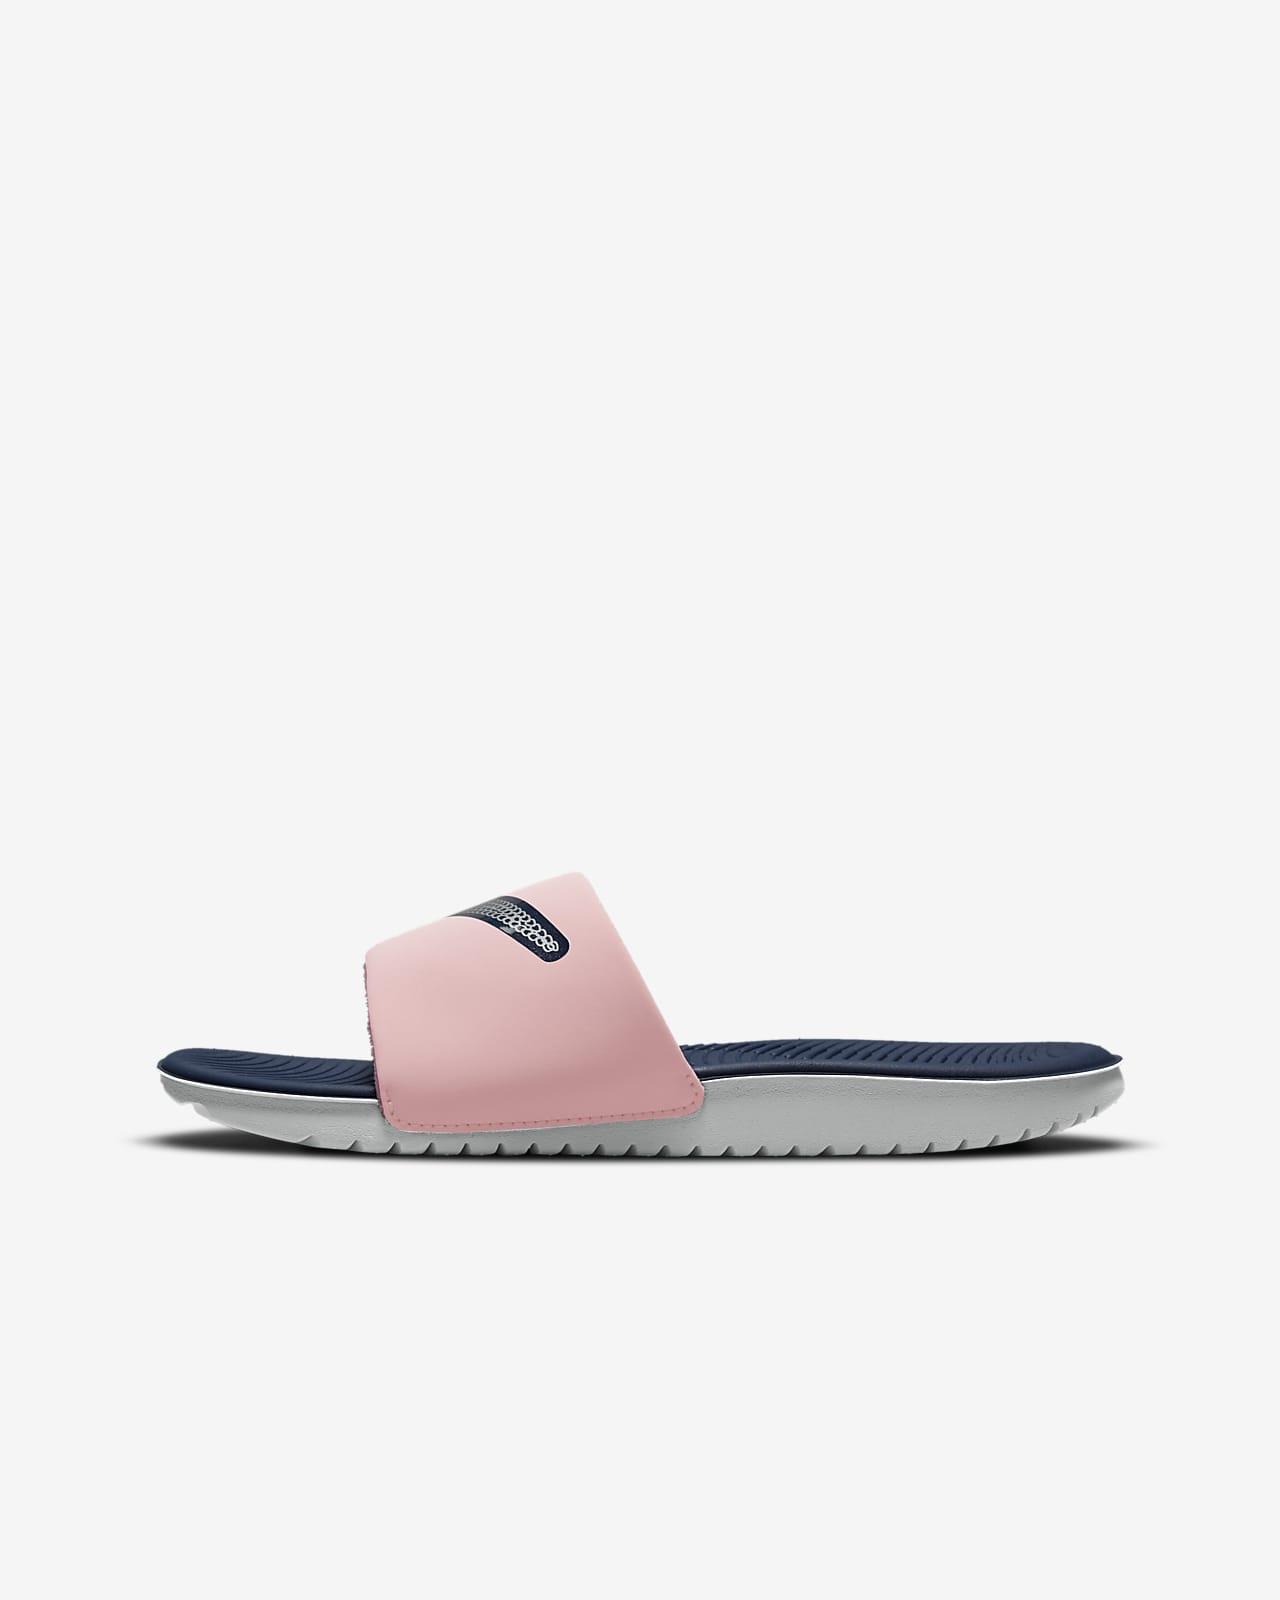 Nike Kawa SE Big/Little Kids' Slides